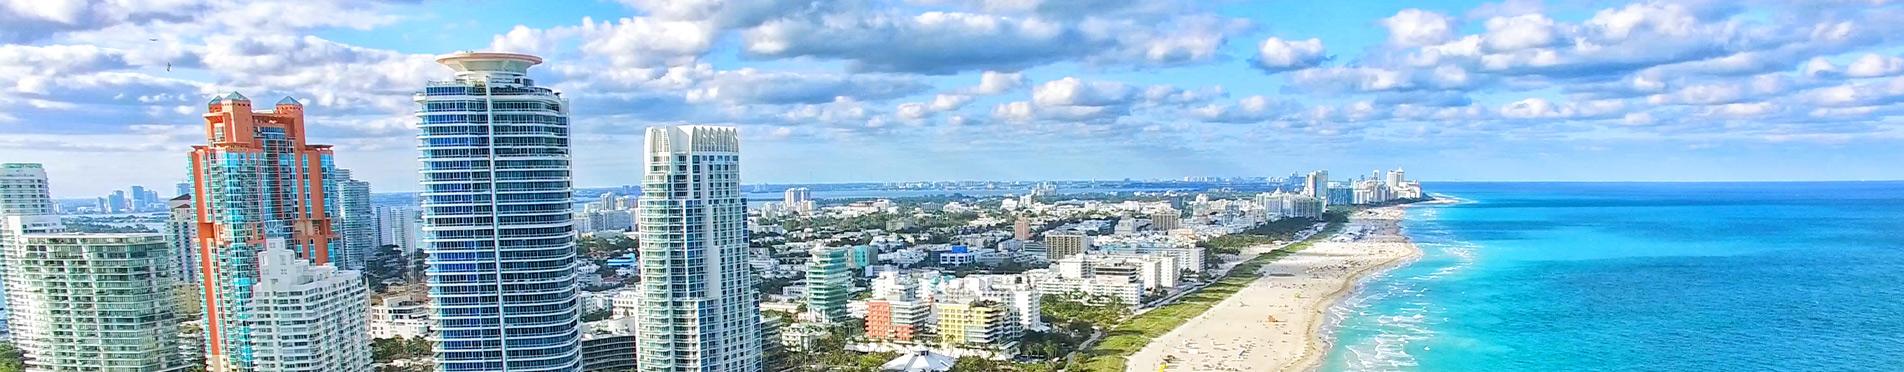 Miami Beach overhead image of coastline